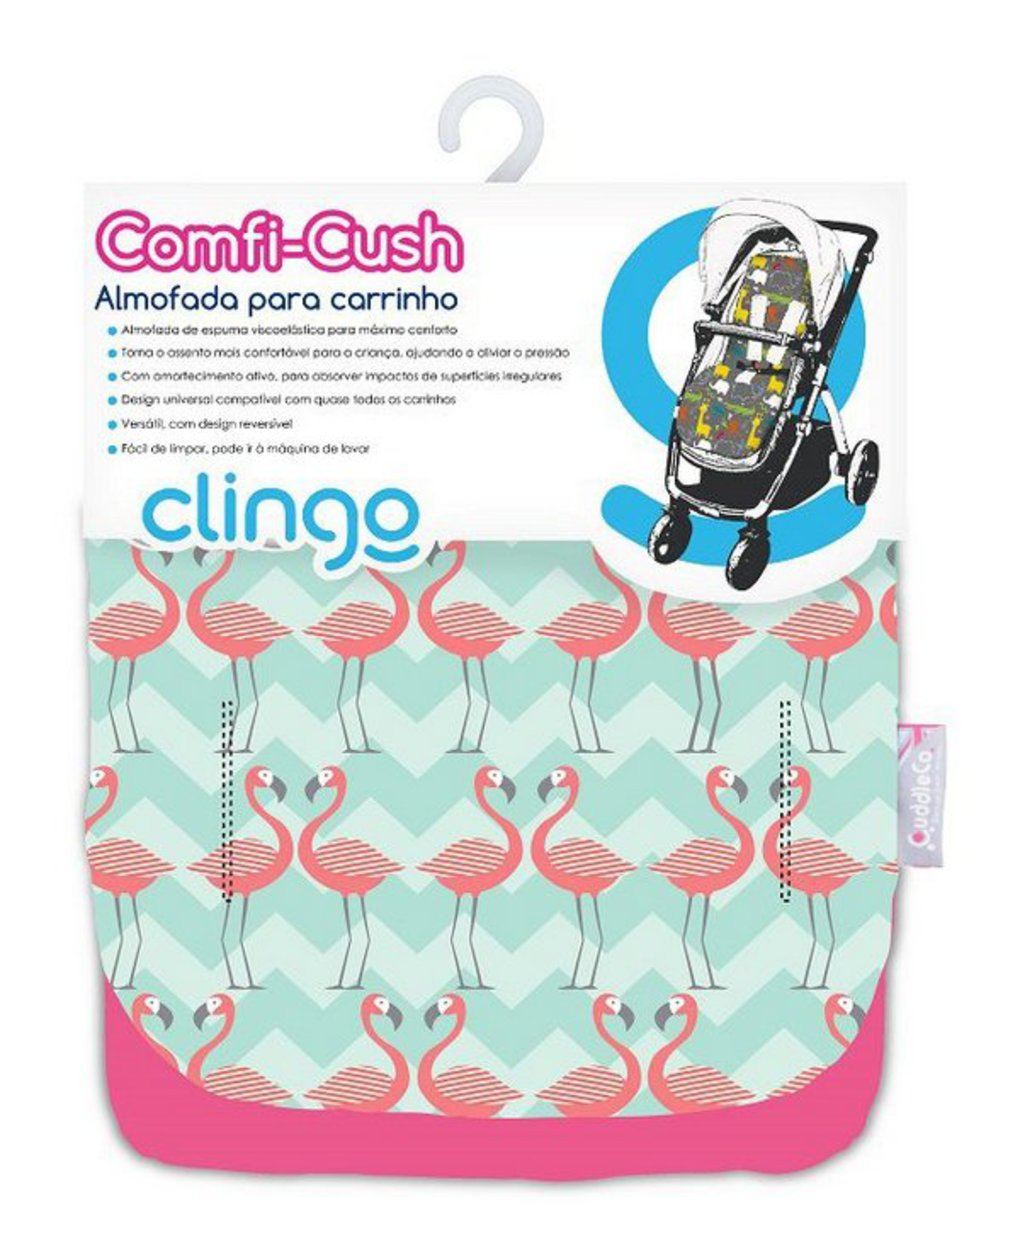 Comfi-cush mem flamingo - Cuddleco